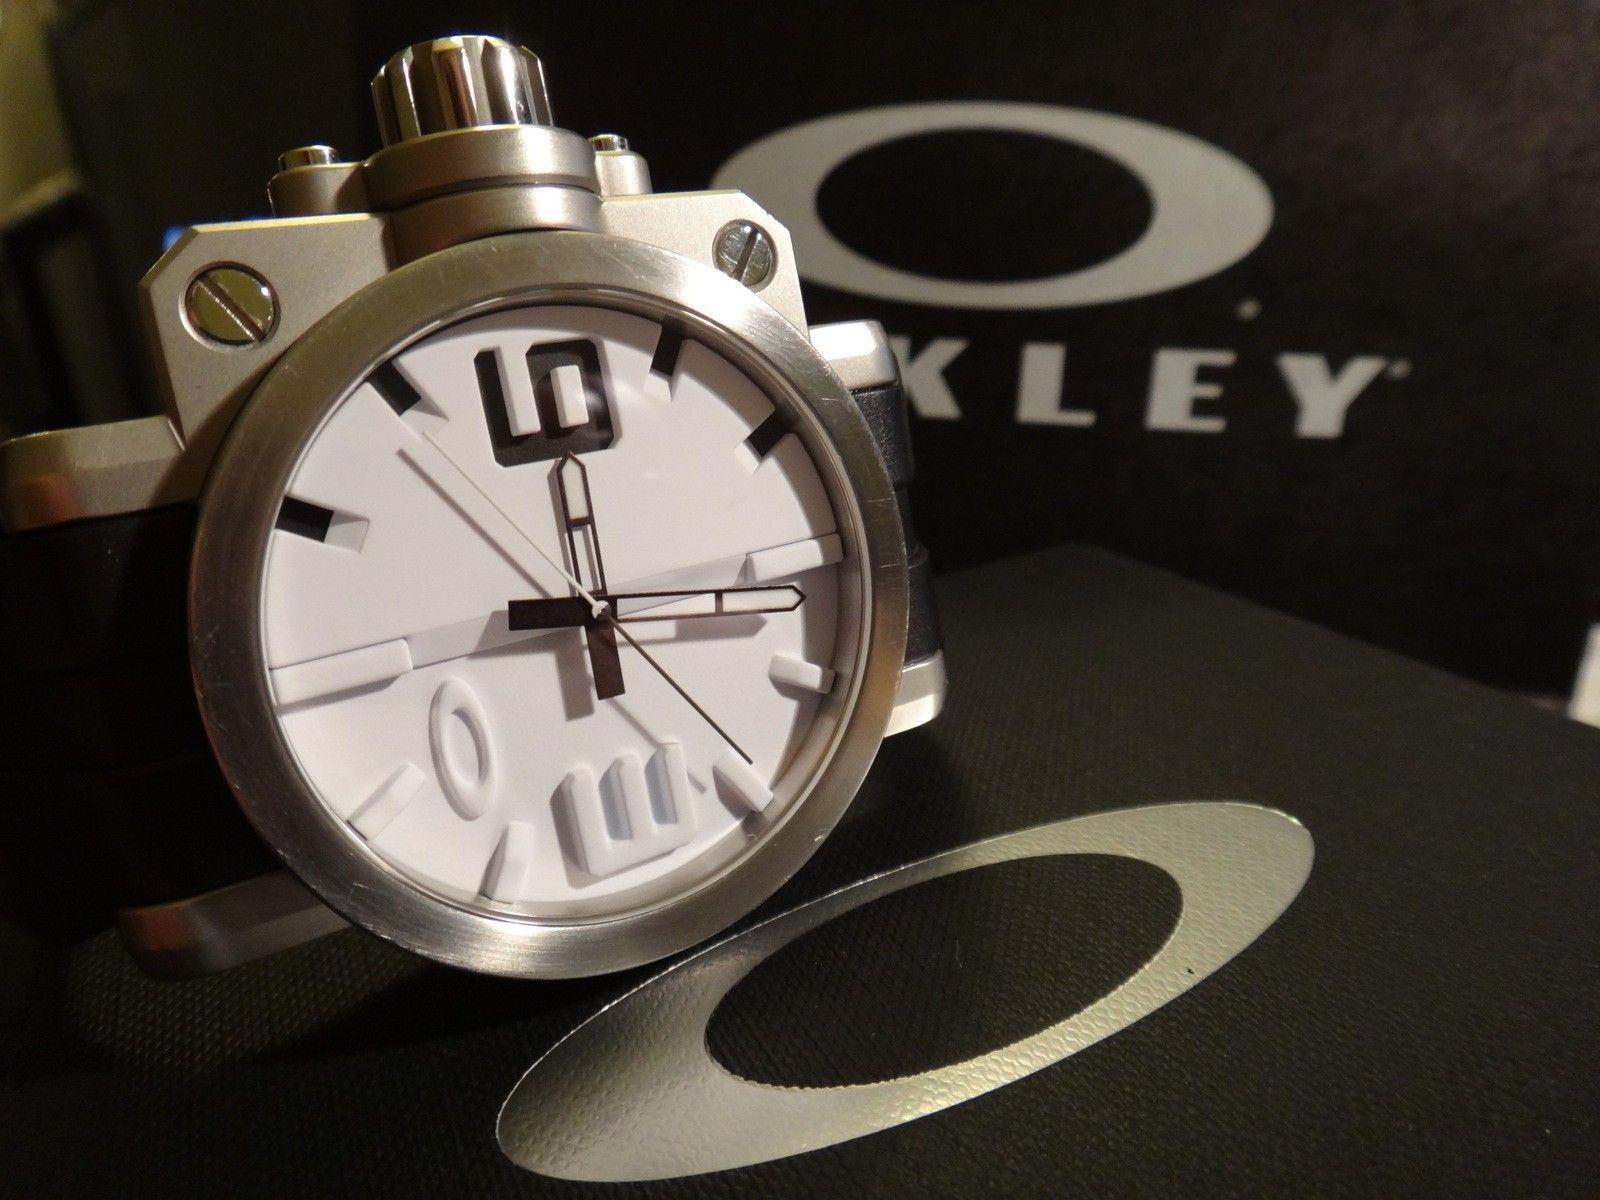 Oakley Gearbox brushed WHITE dial 10-064 stainless steel - DSC05715.JPG